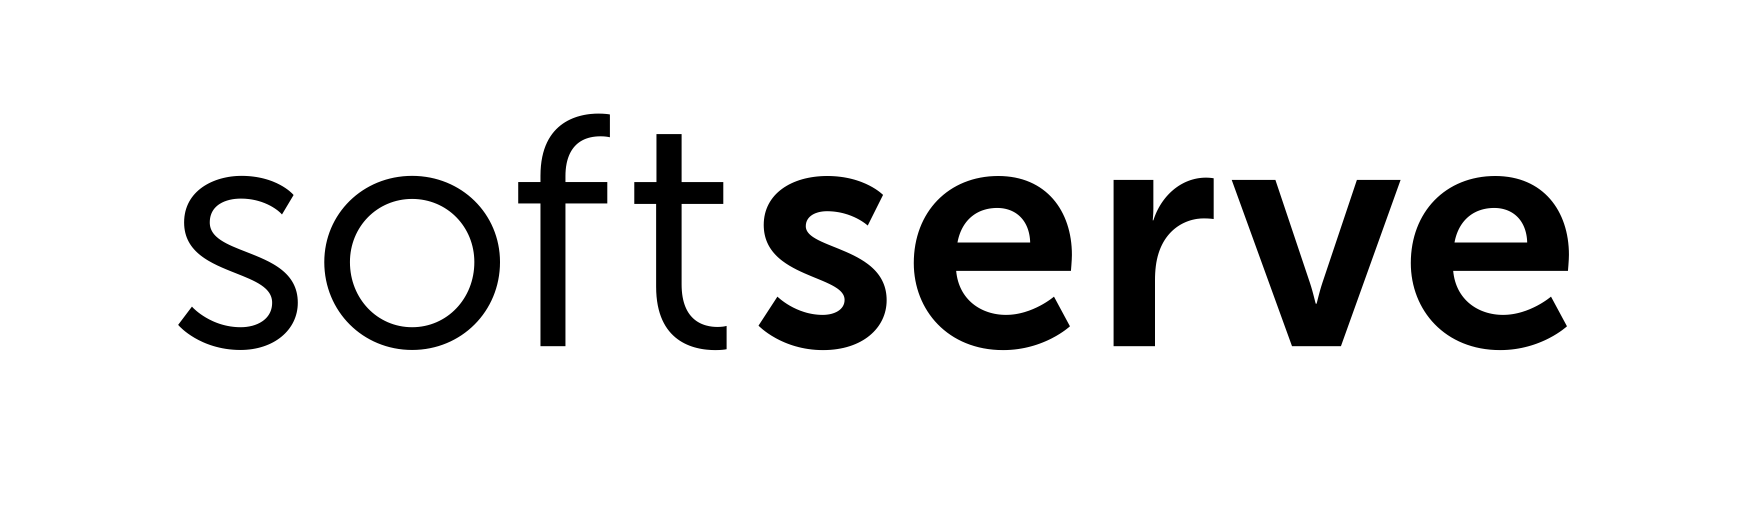 SoftServe_logo_new